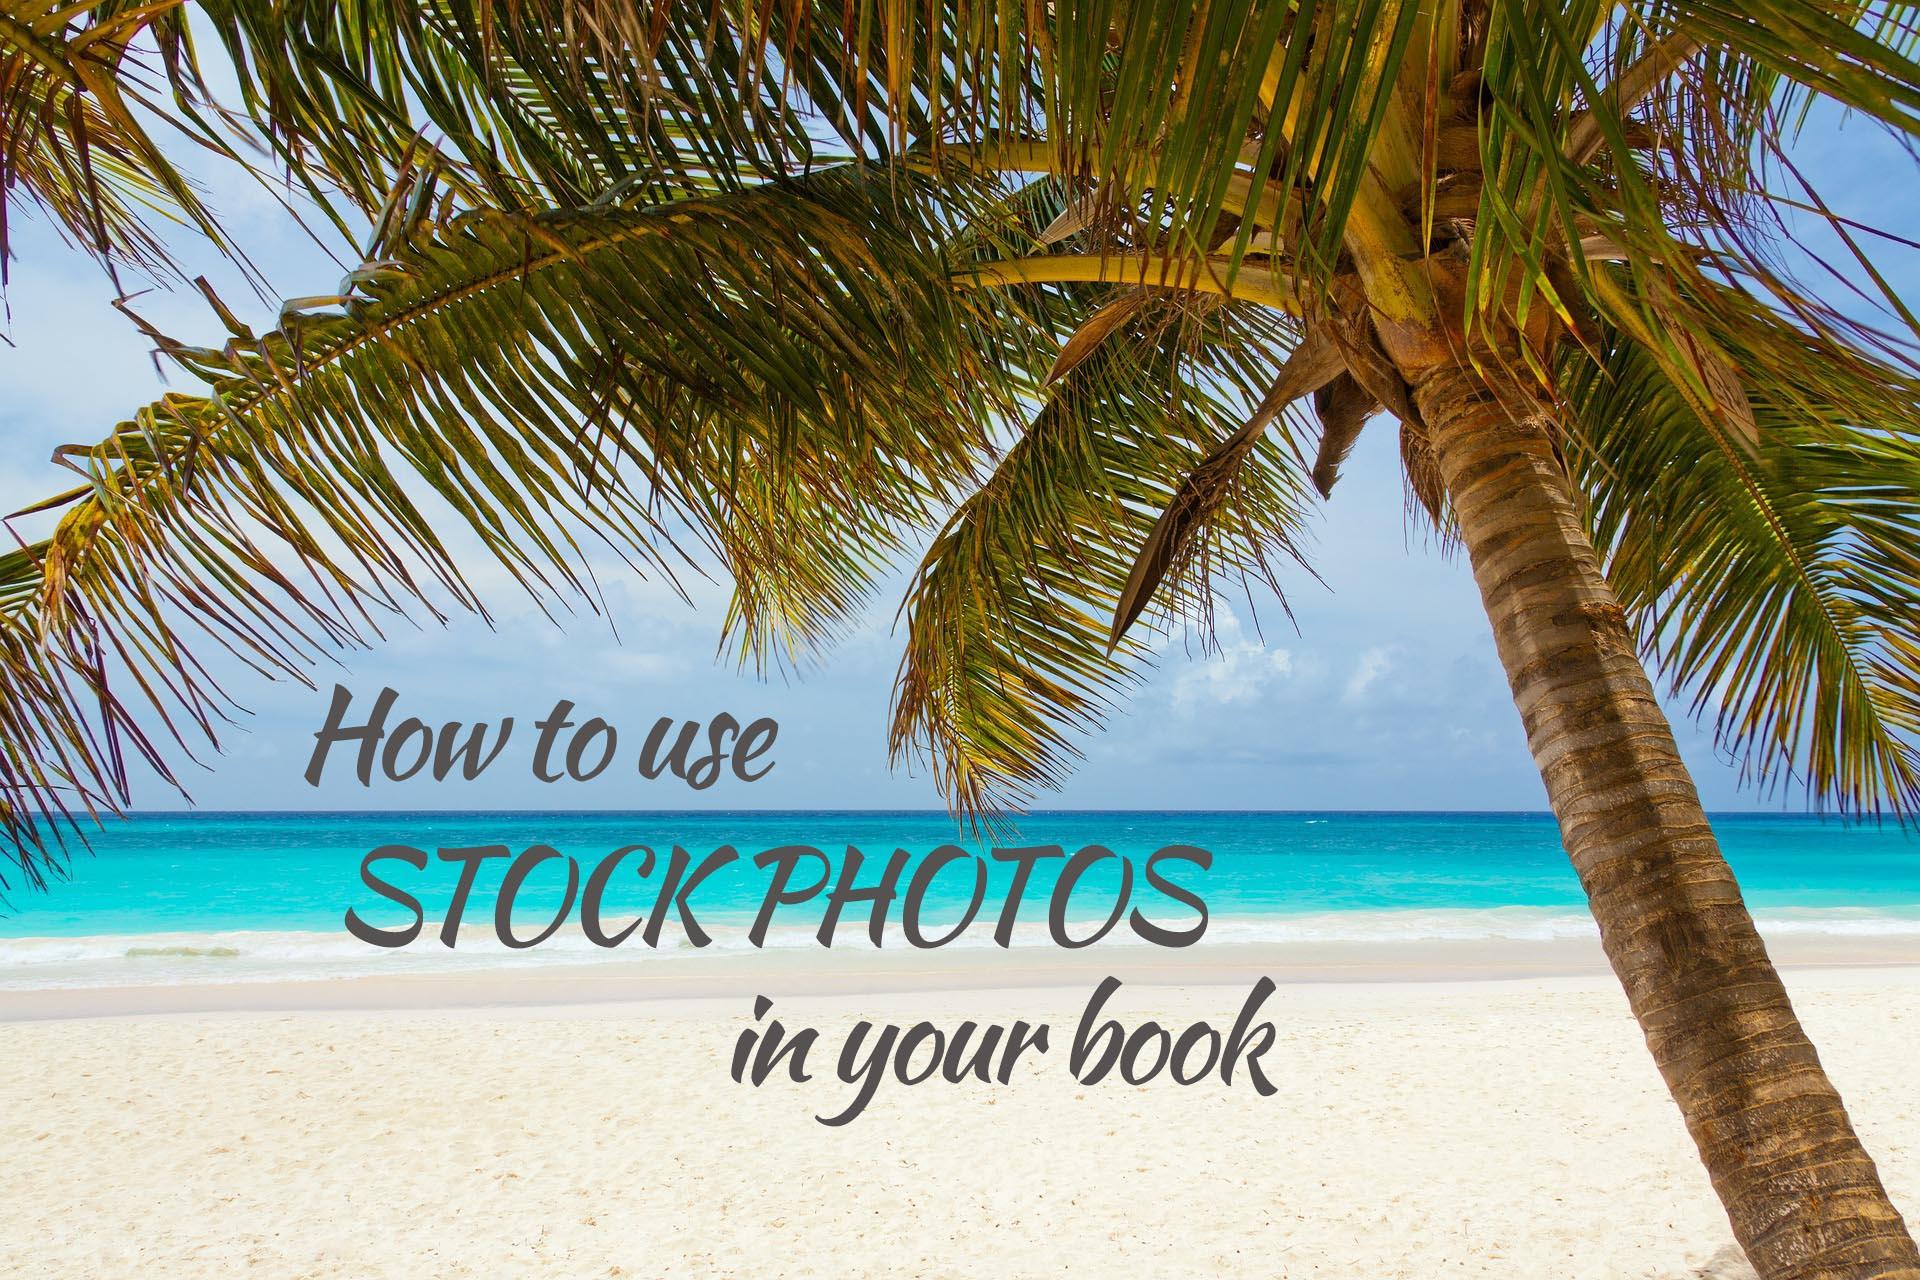 To Buy Stocks For Free Stock Photos